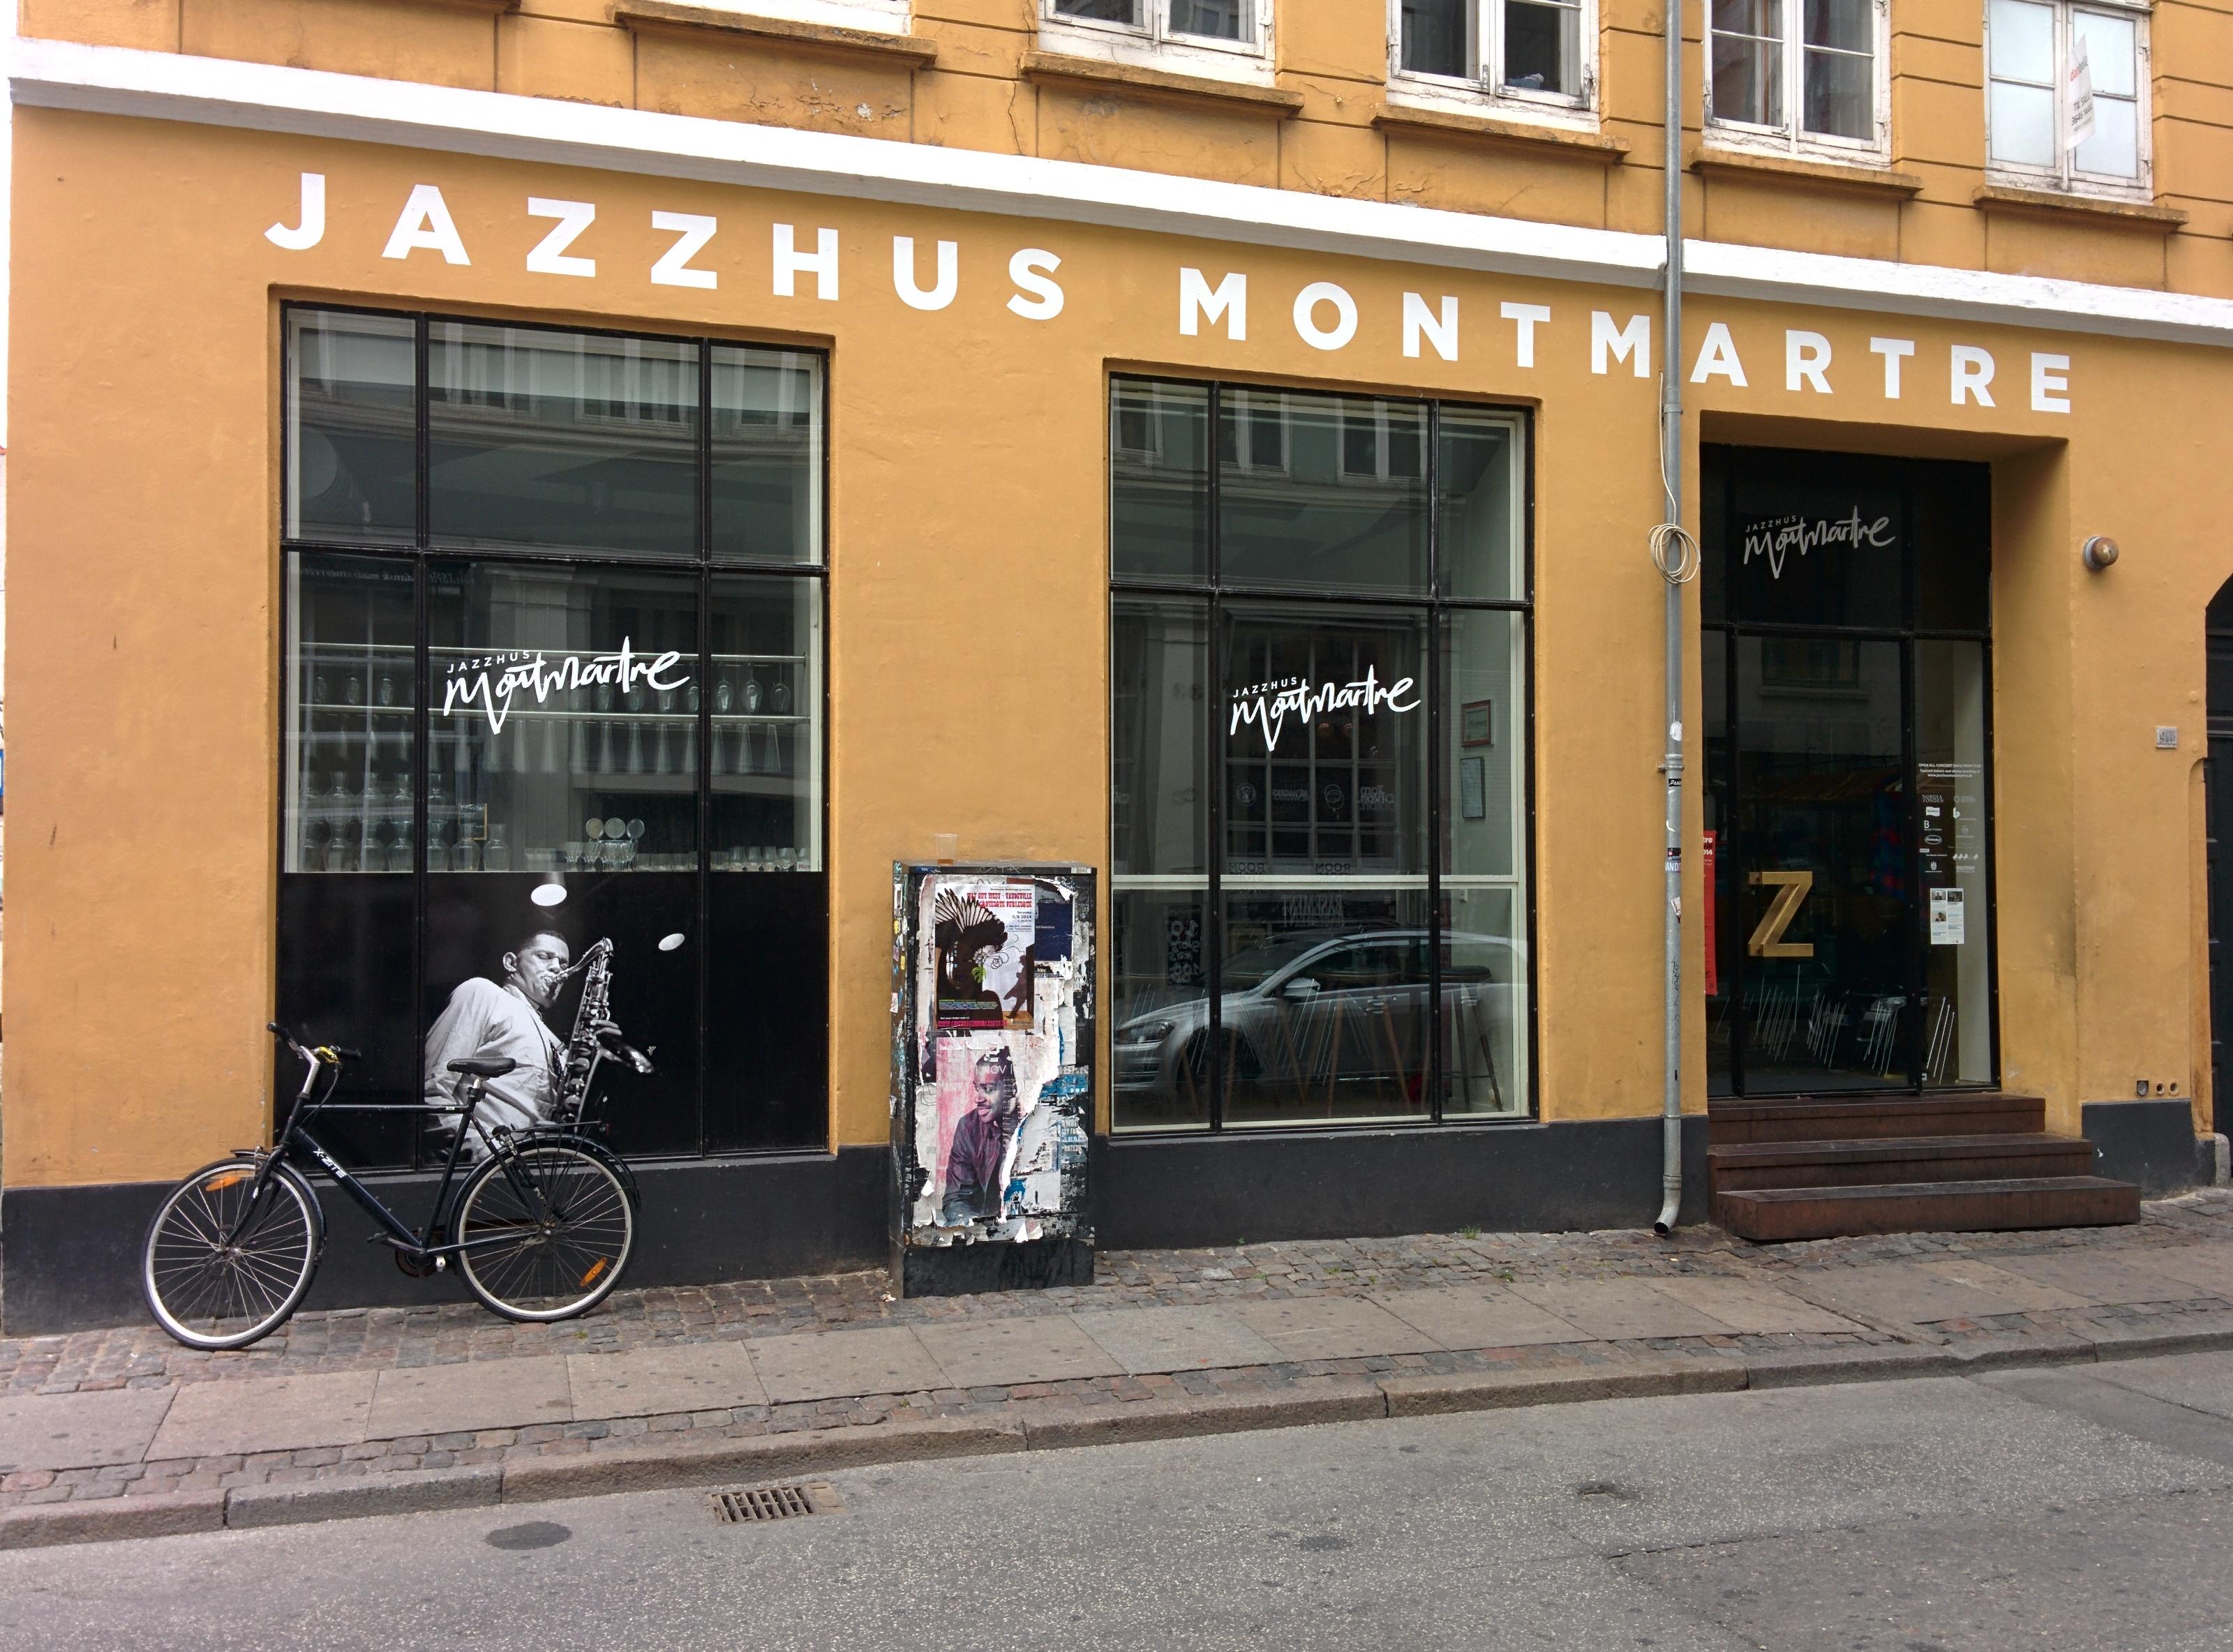 Jazzhus Montmartre Wikipedia